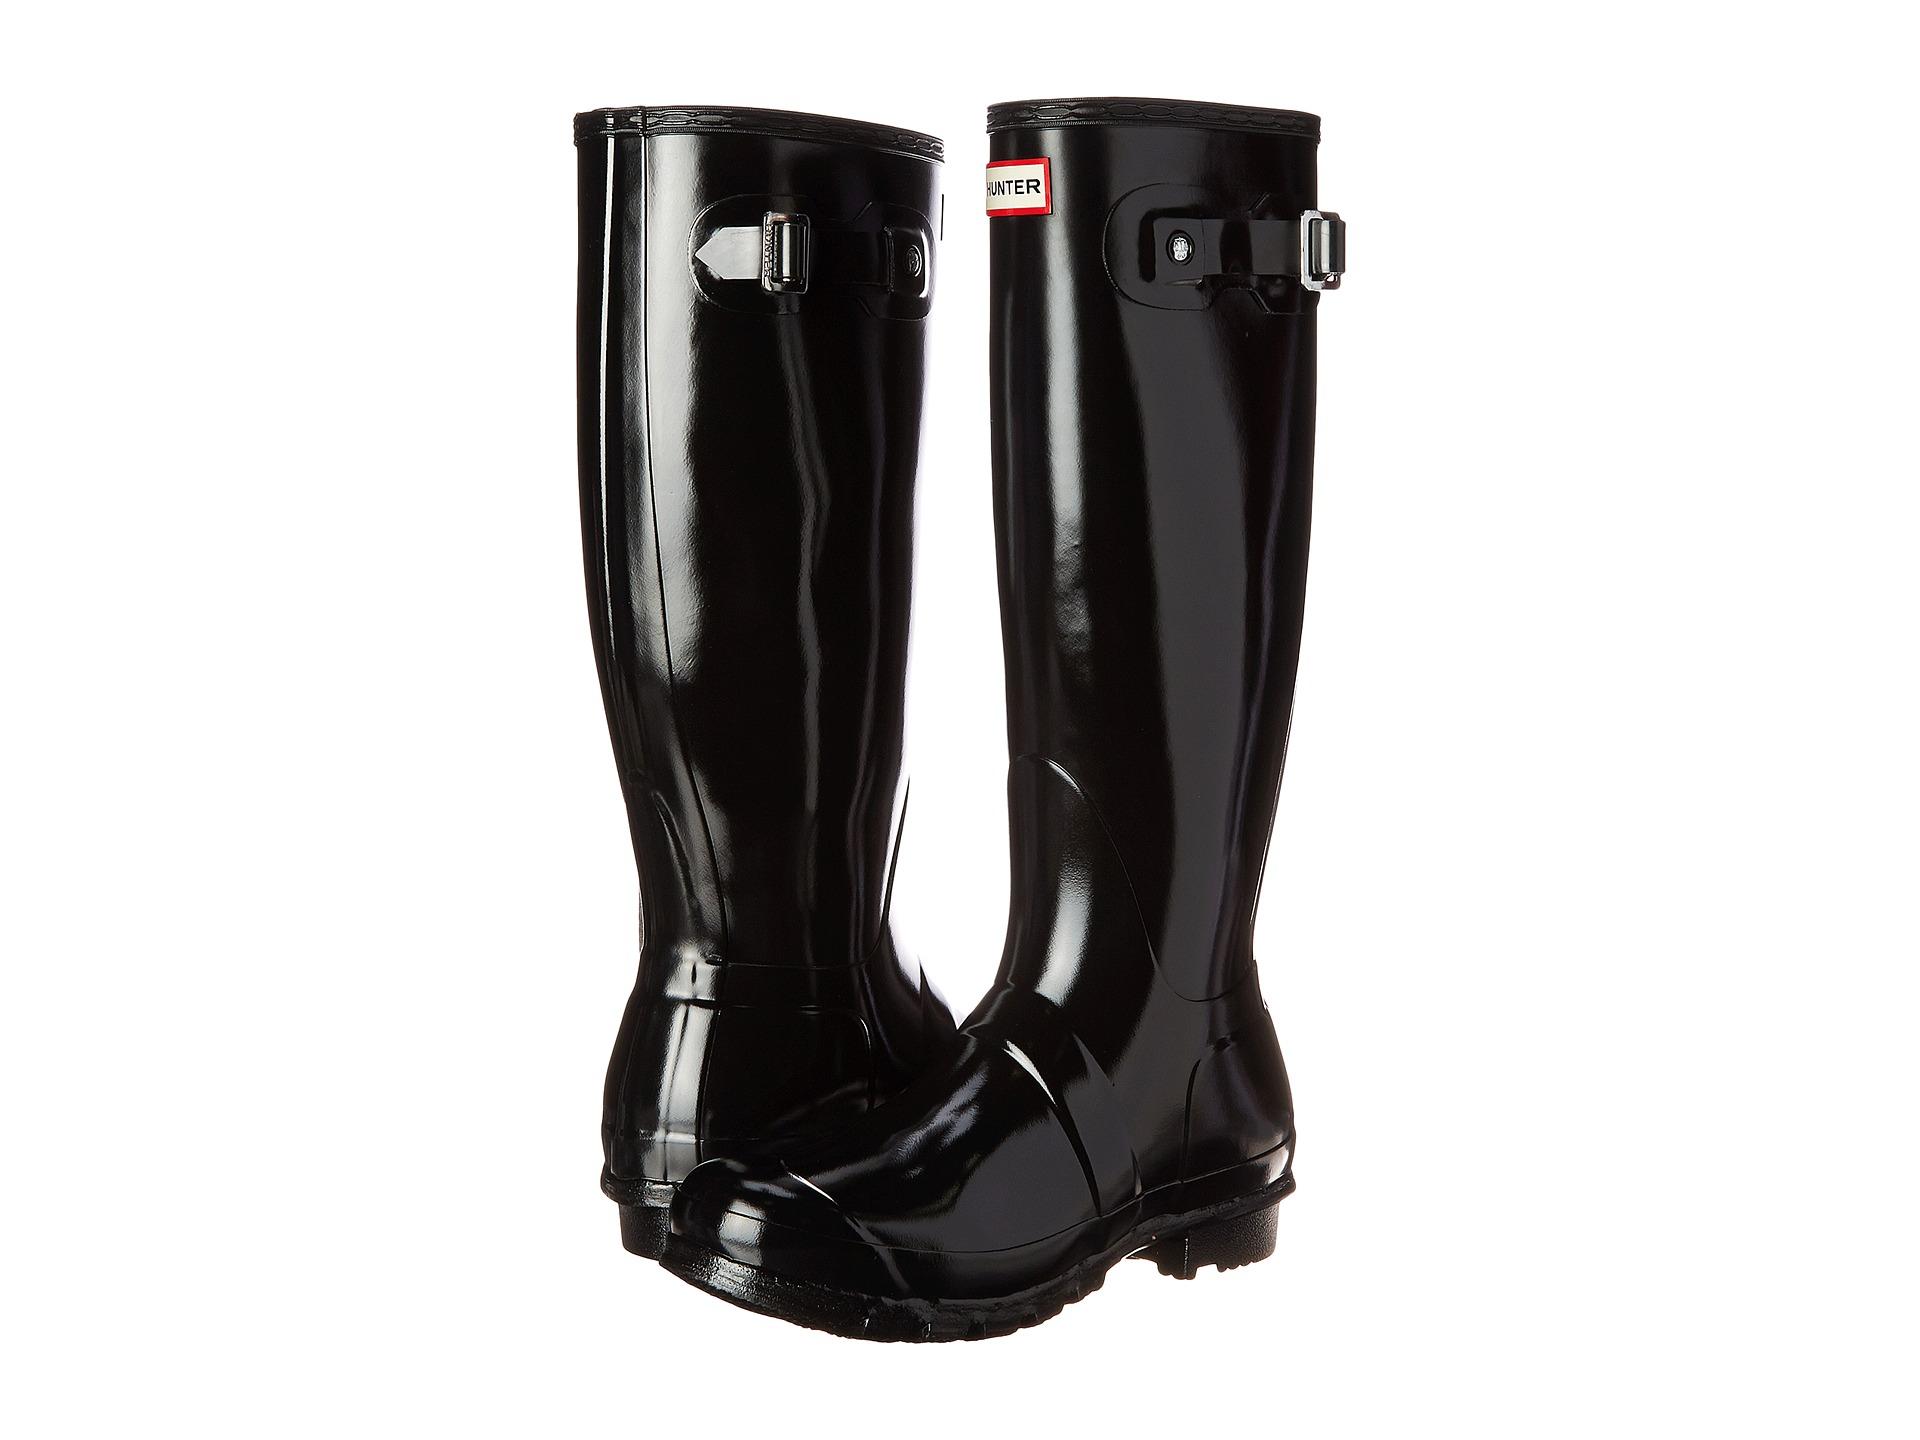 Hunter Original Tall Gloss Rain Boots at Zappos.com